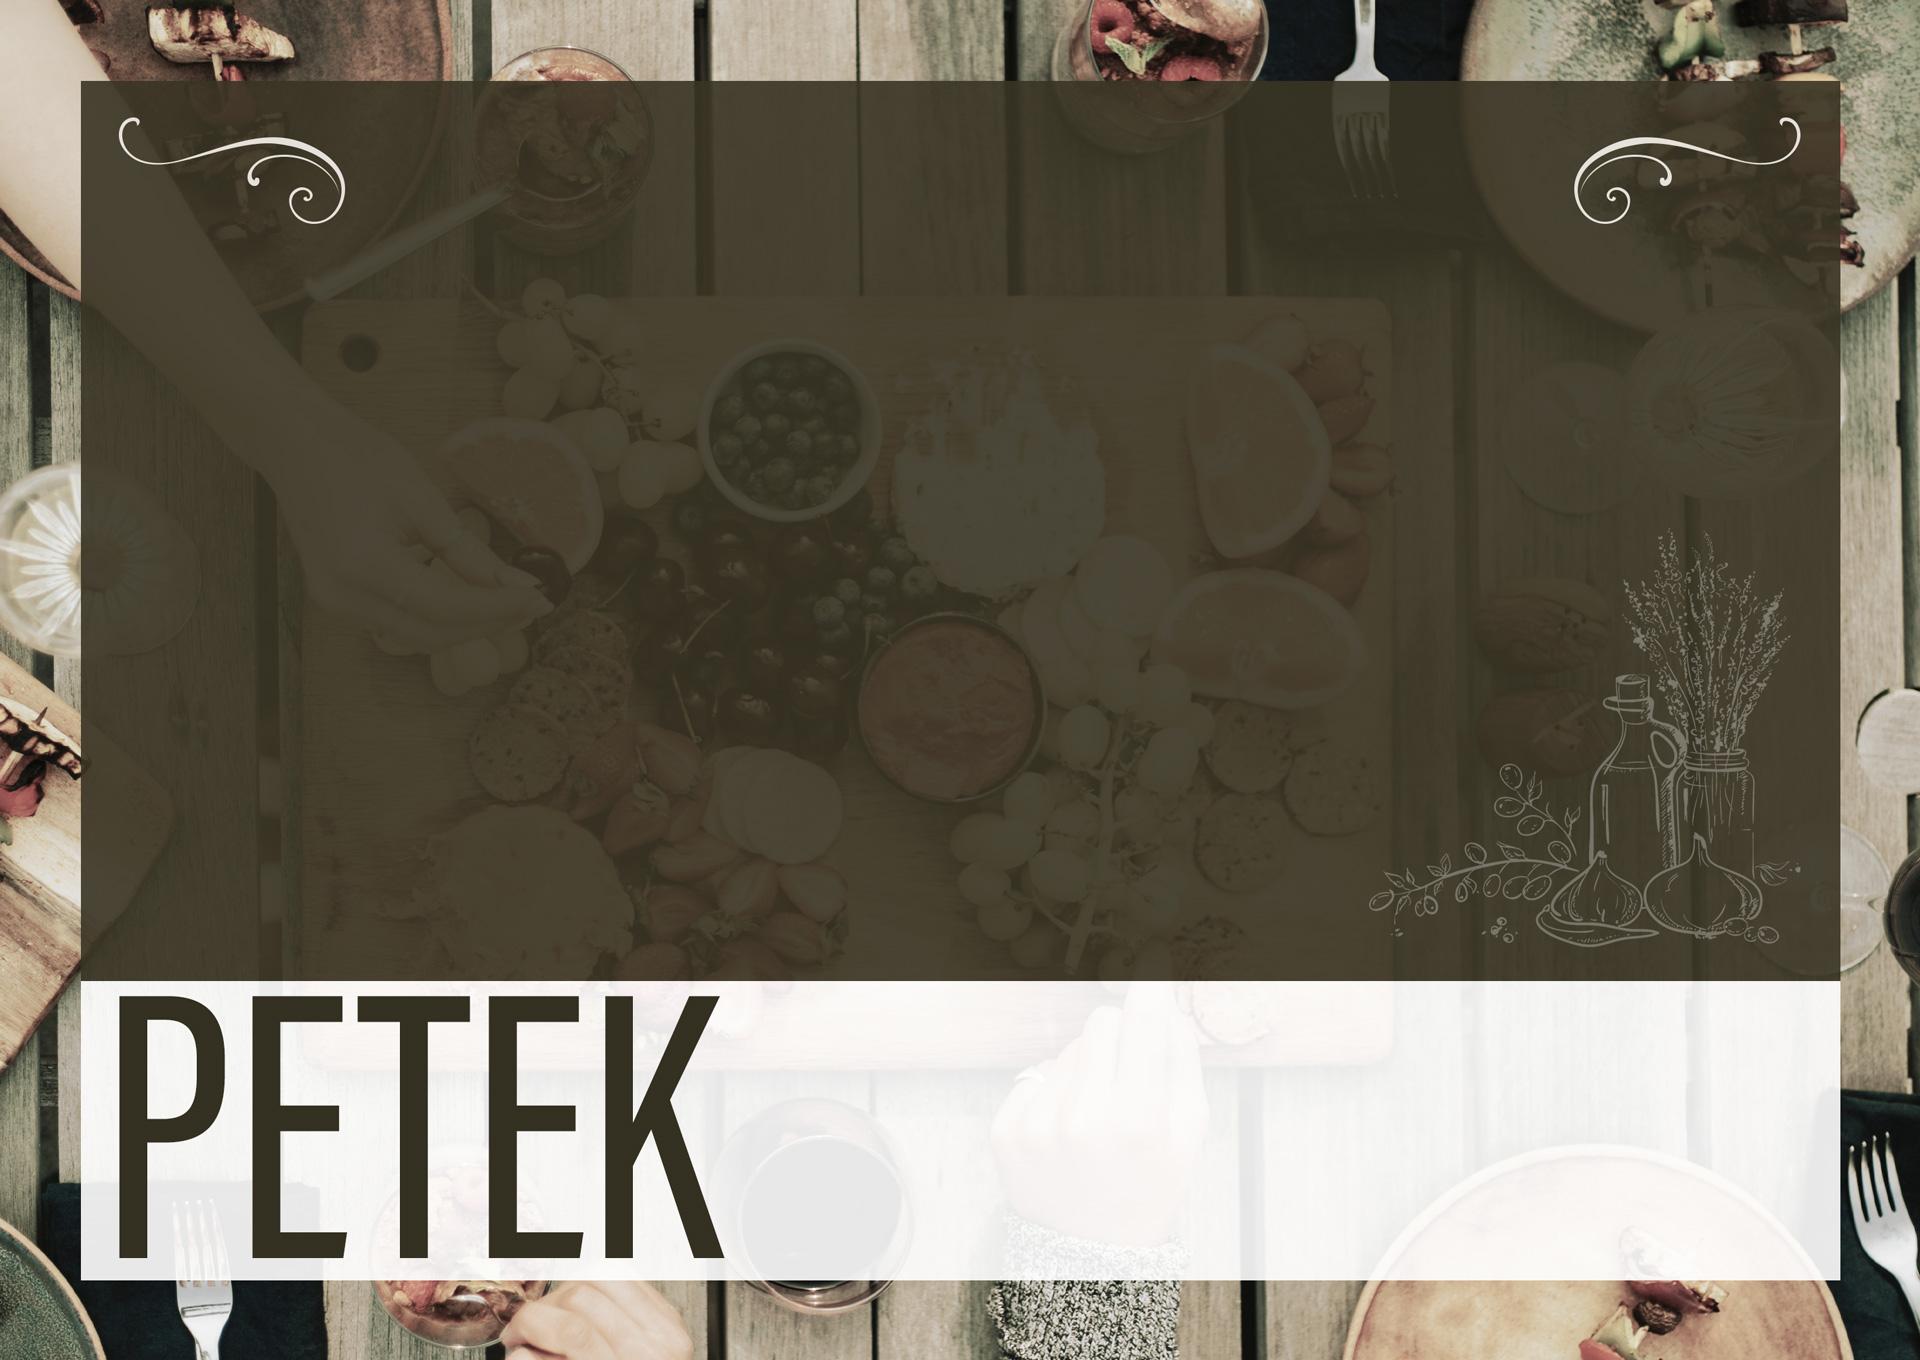 PETEK 12.3.2021